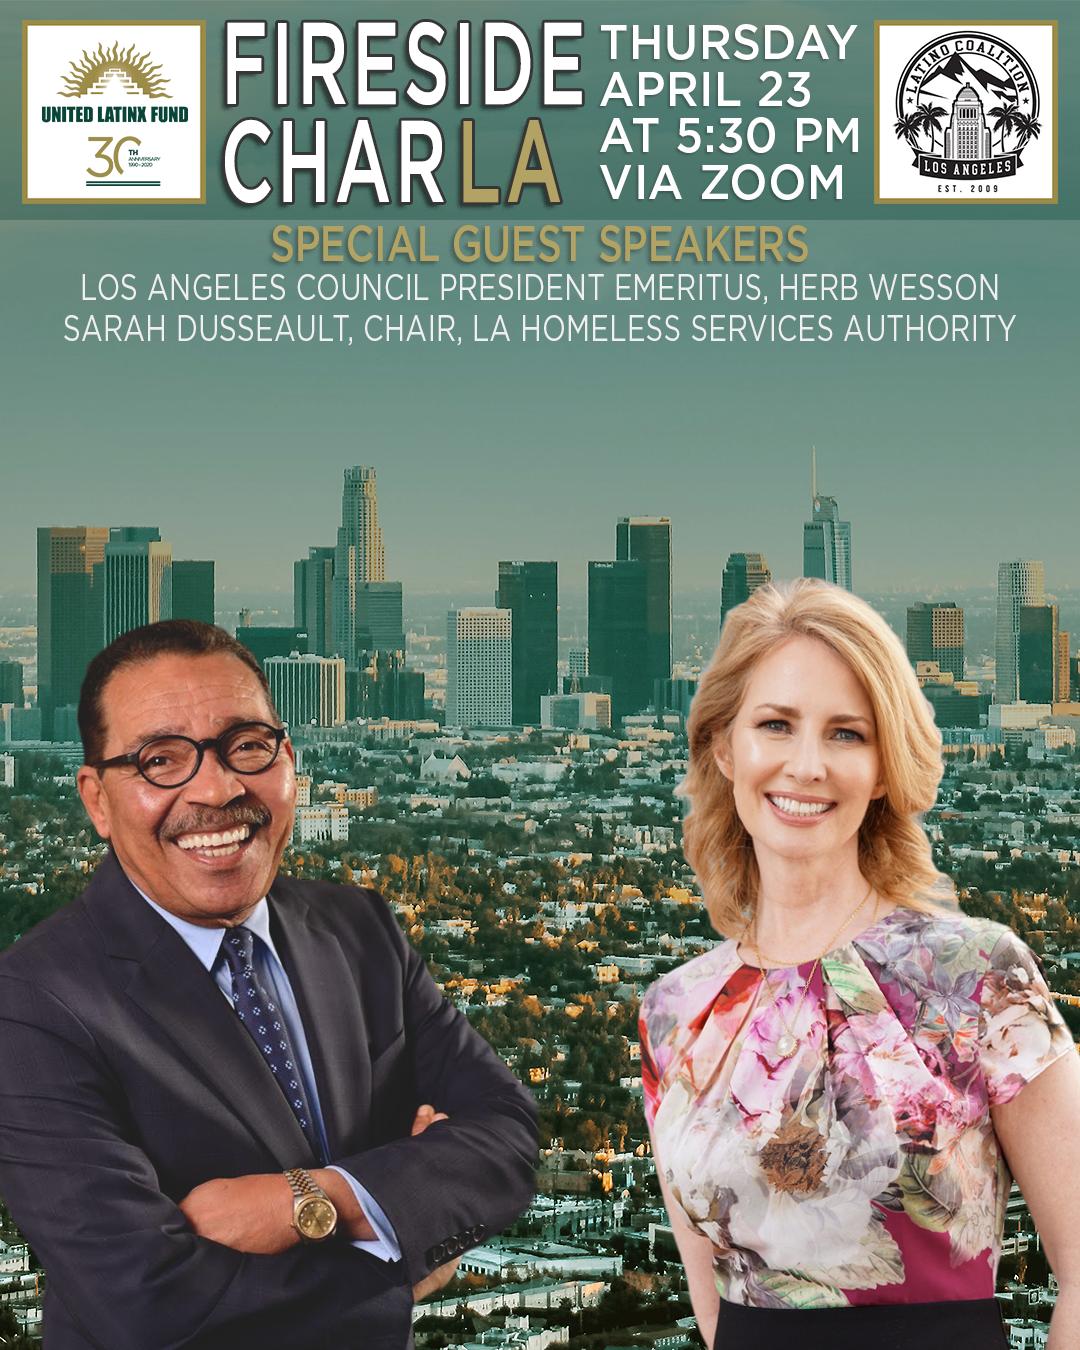 4/23/2020 Fireside CharLA - Featuring Emeritus Herb J. Wesson, Jr. & Sarah Dusseault